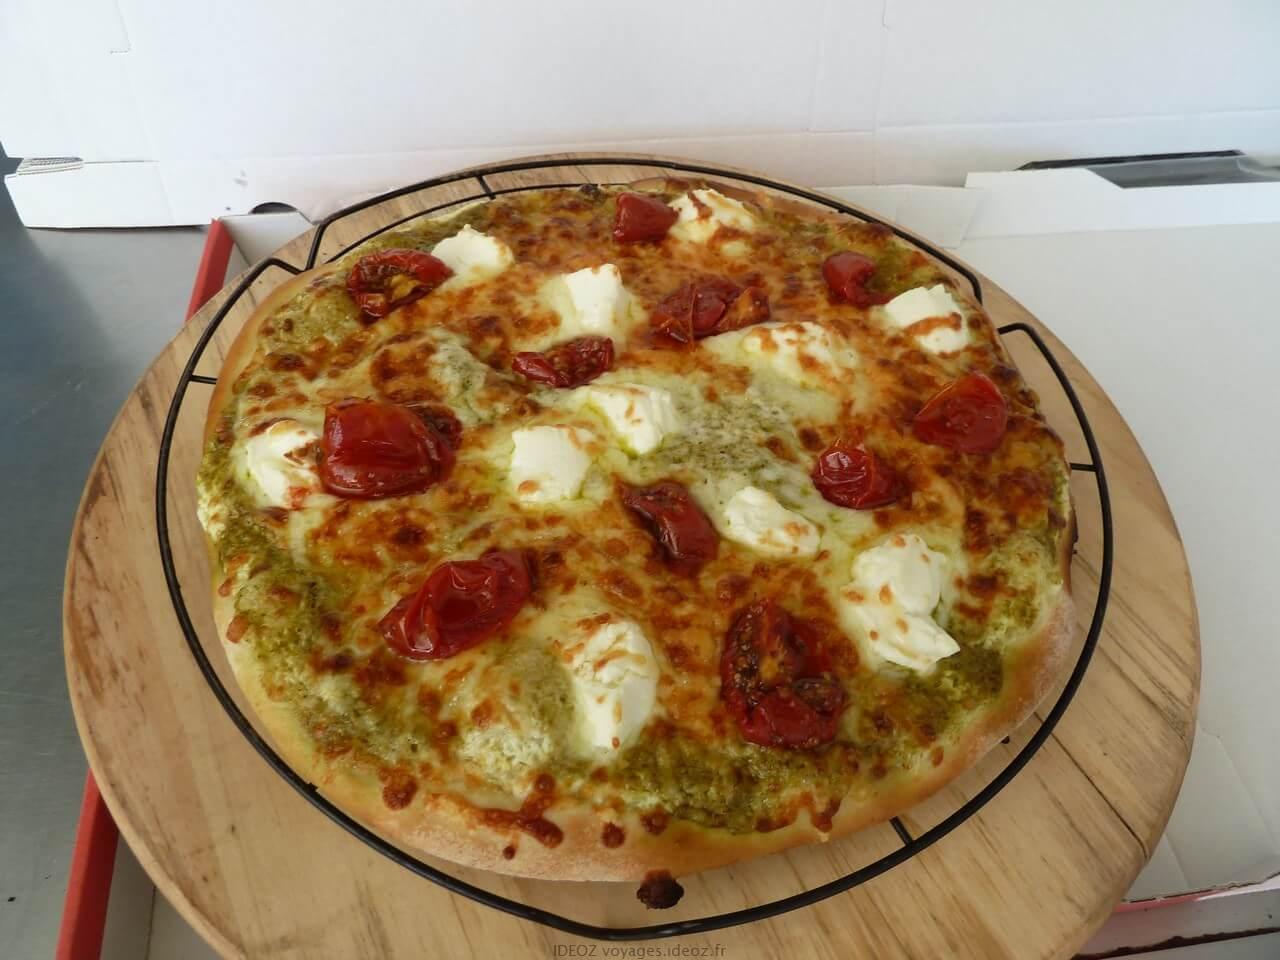 Pizza Tarantella au pesto ricotta et tomates séchées